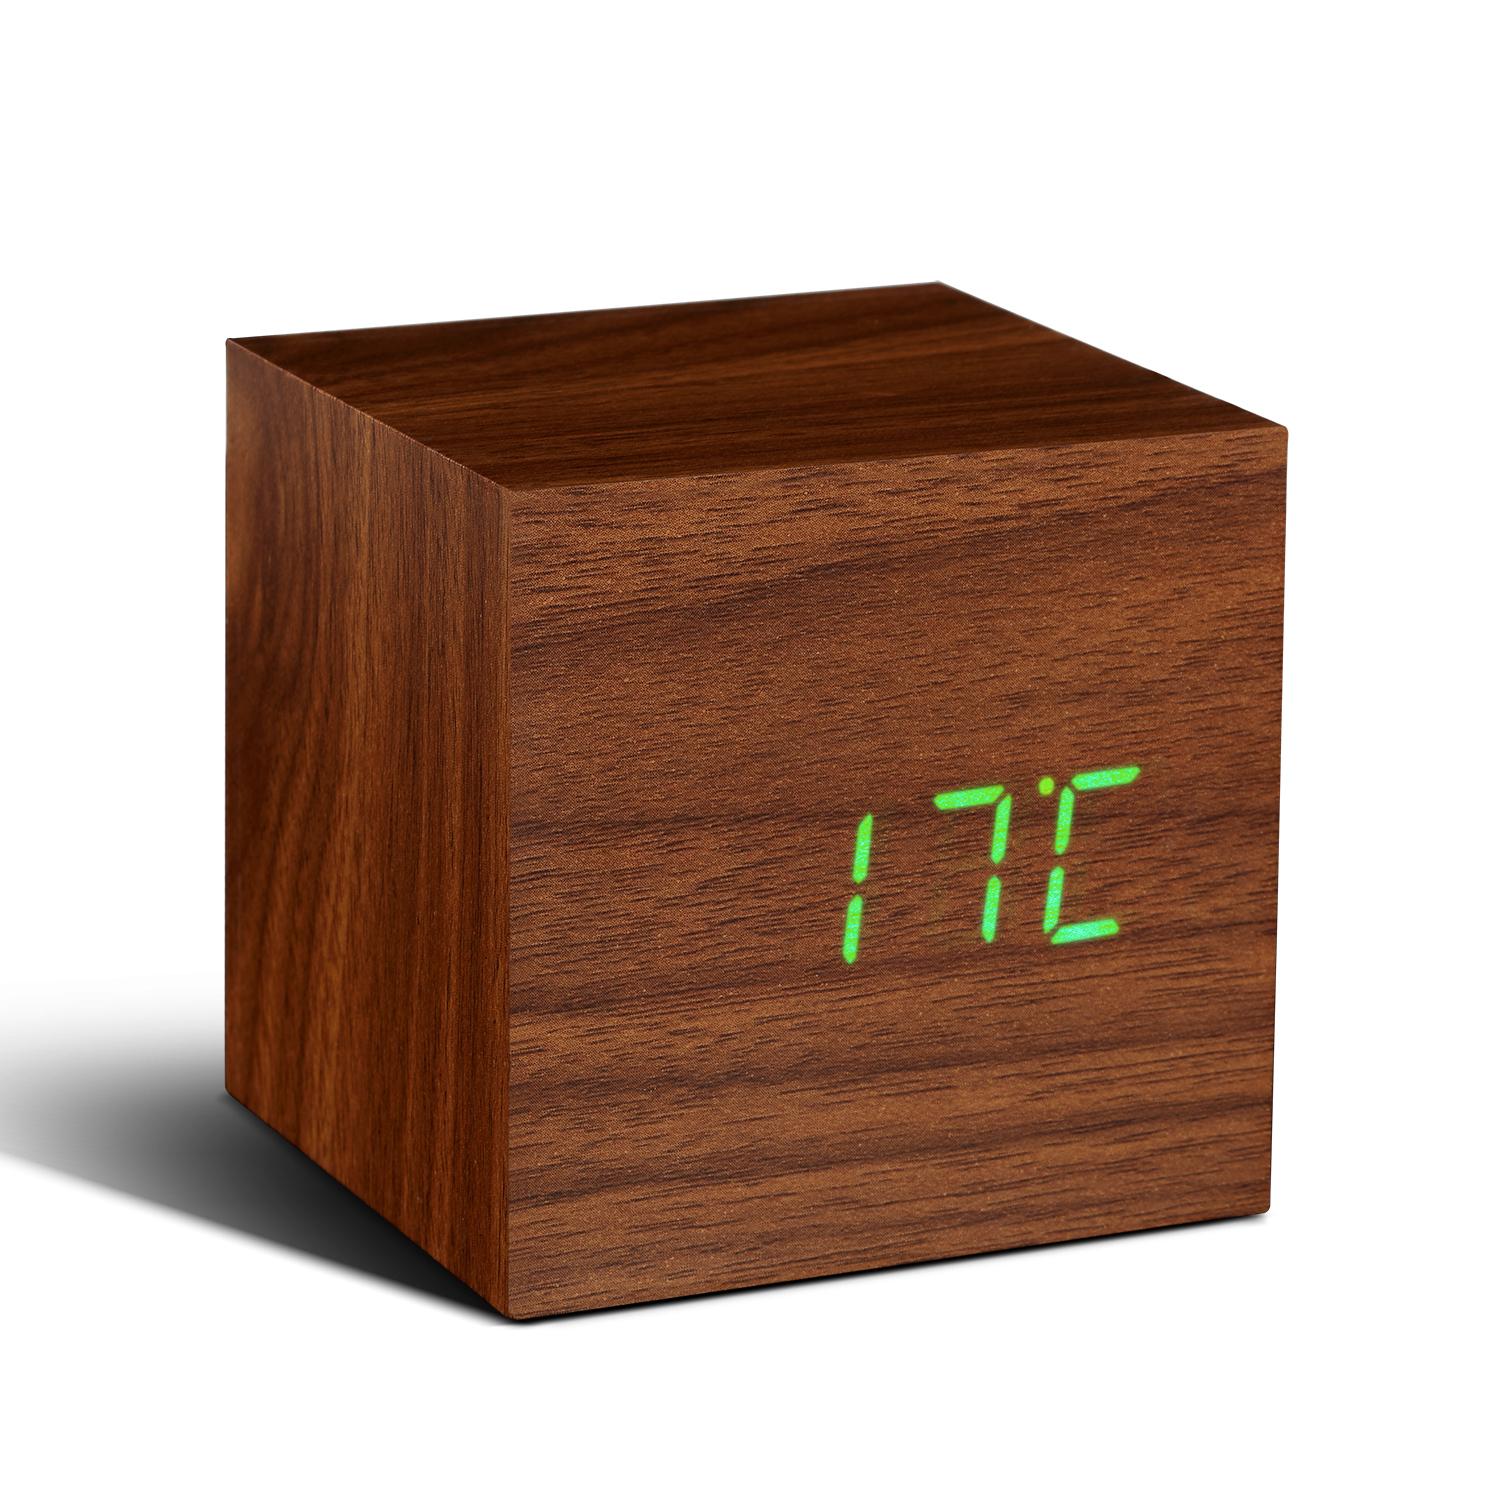 Gingko – Cube Walnut Click Clock with Green LED Display in Gift Box